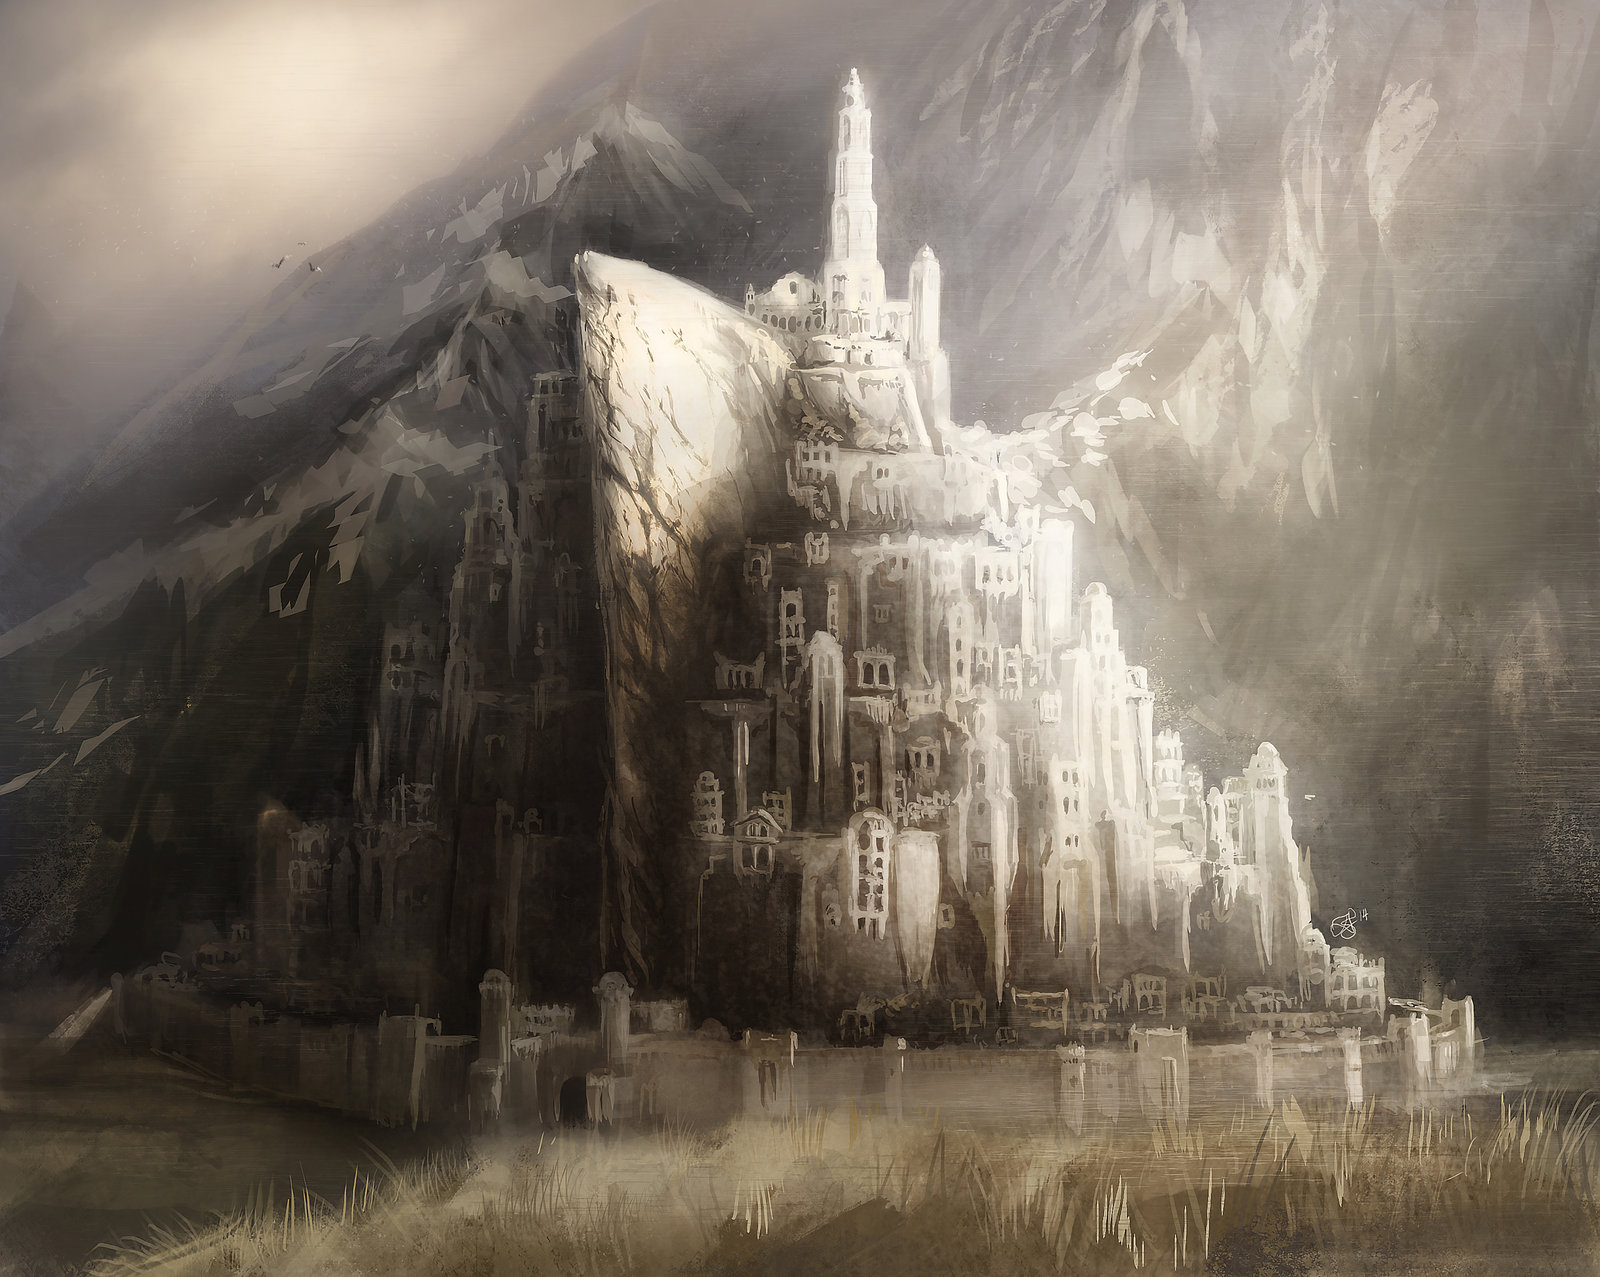 Arquitectos Buscan 3 Mil Mdd Para Replicar Las Minas Tirith